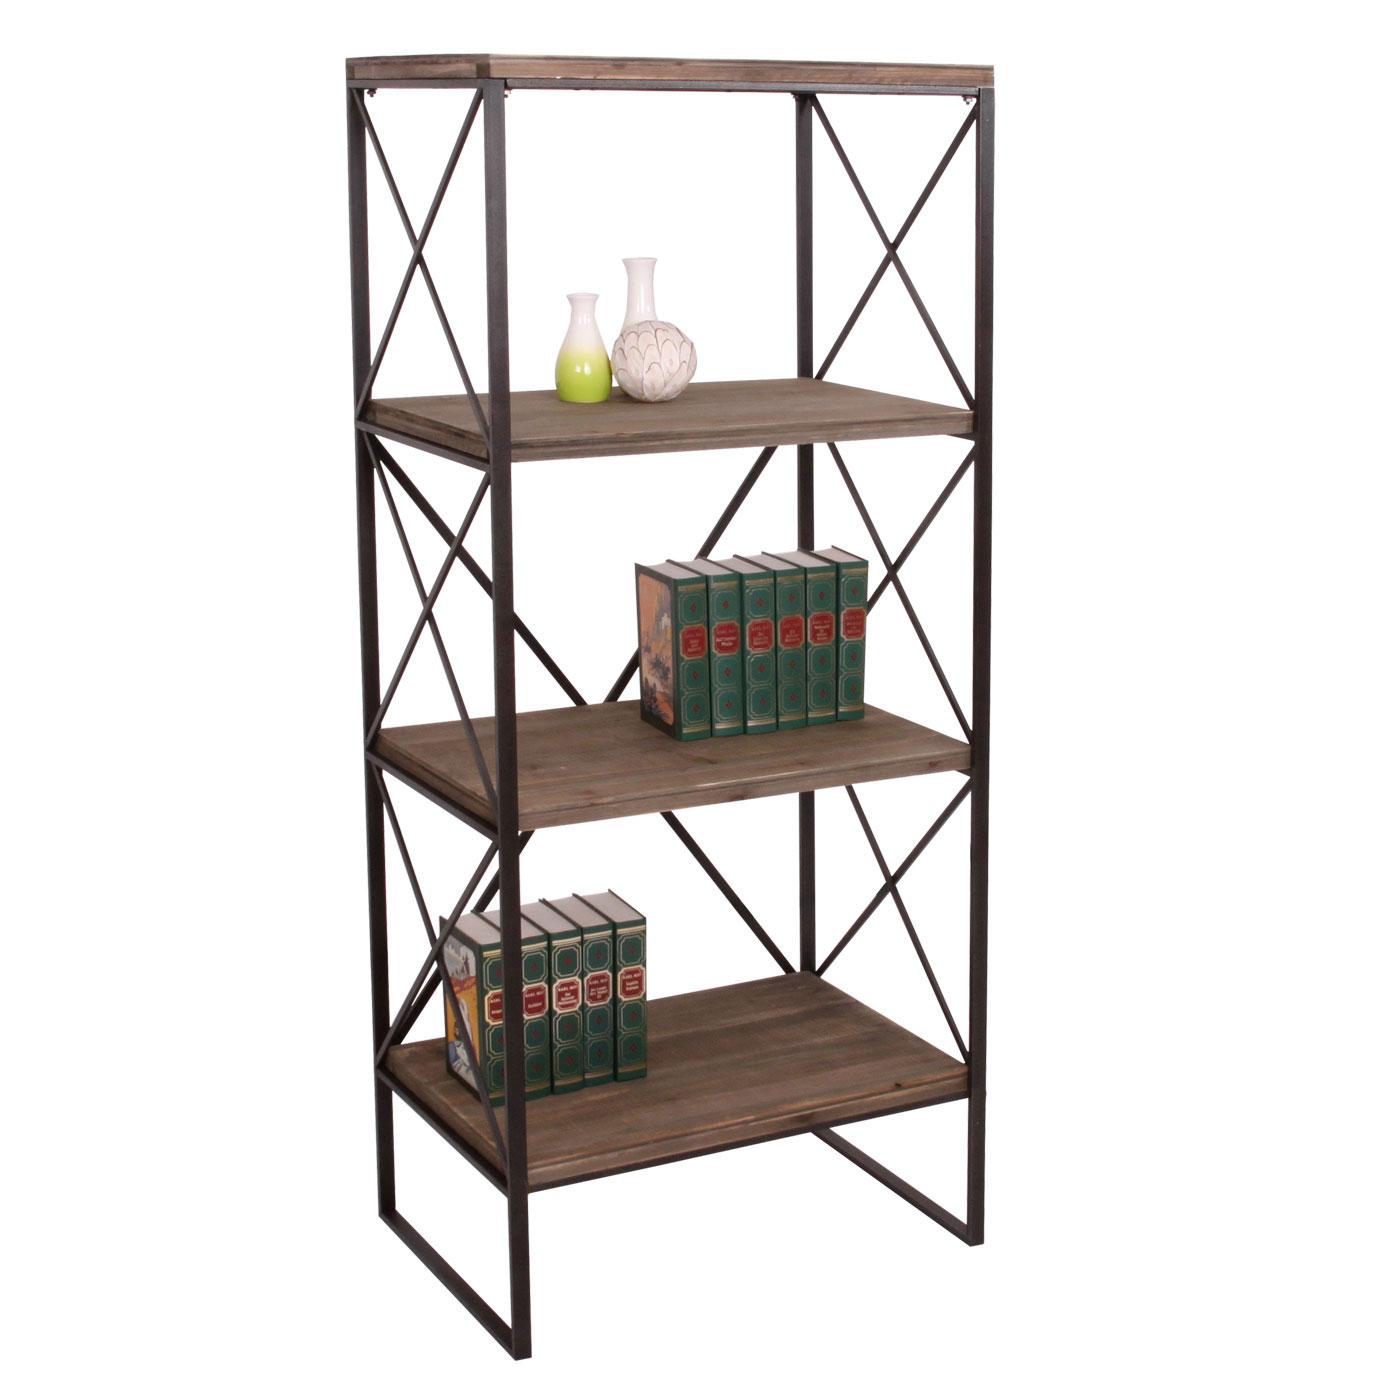 b cherregal hwc echtholz metall 4 ebenen 142x60cm. Black Bedroom Furniture Sets. Home Design Ideas